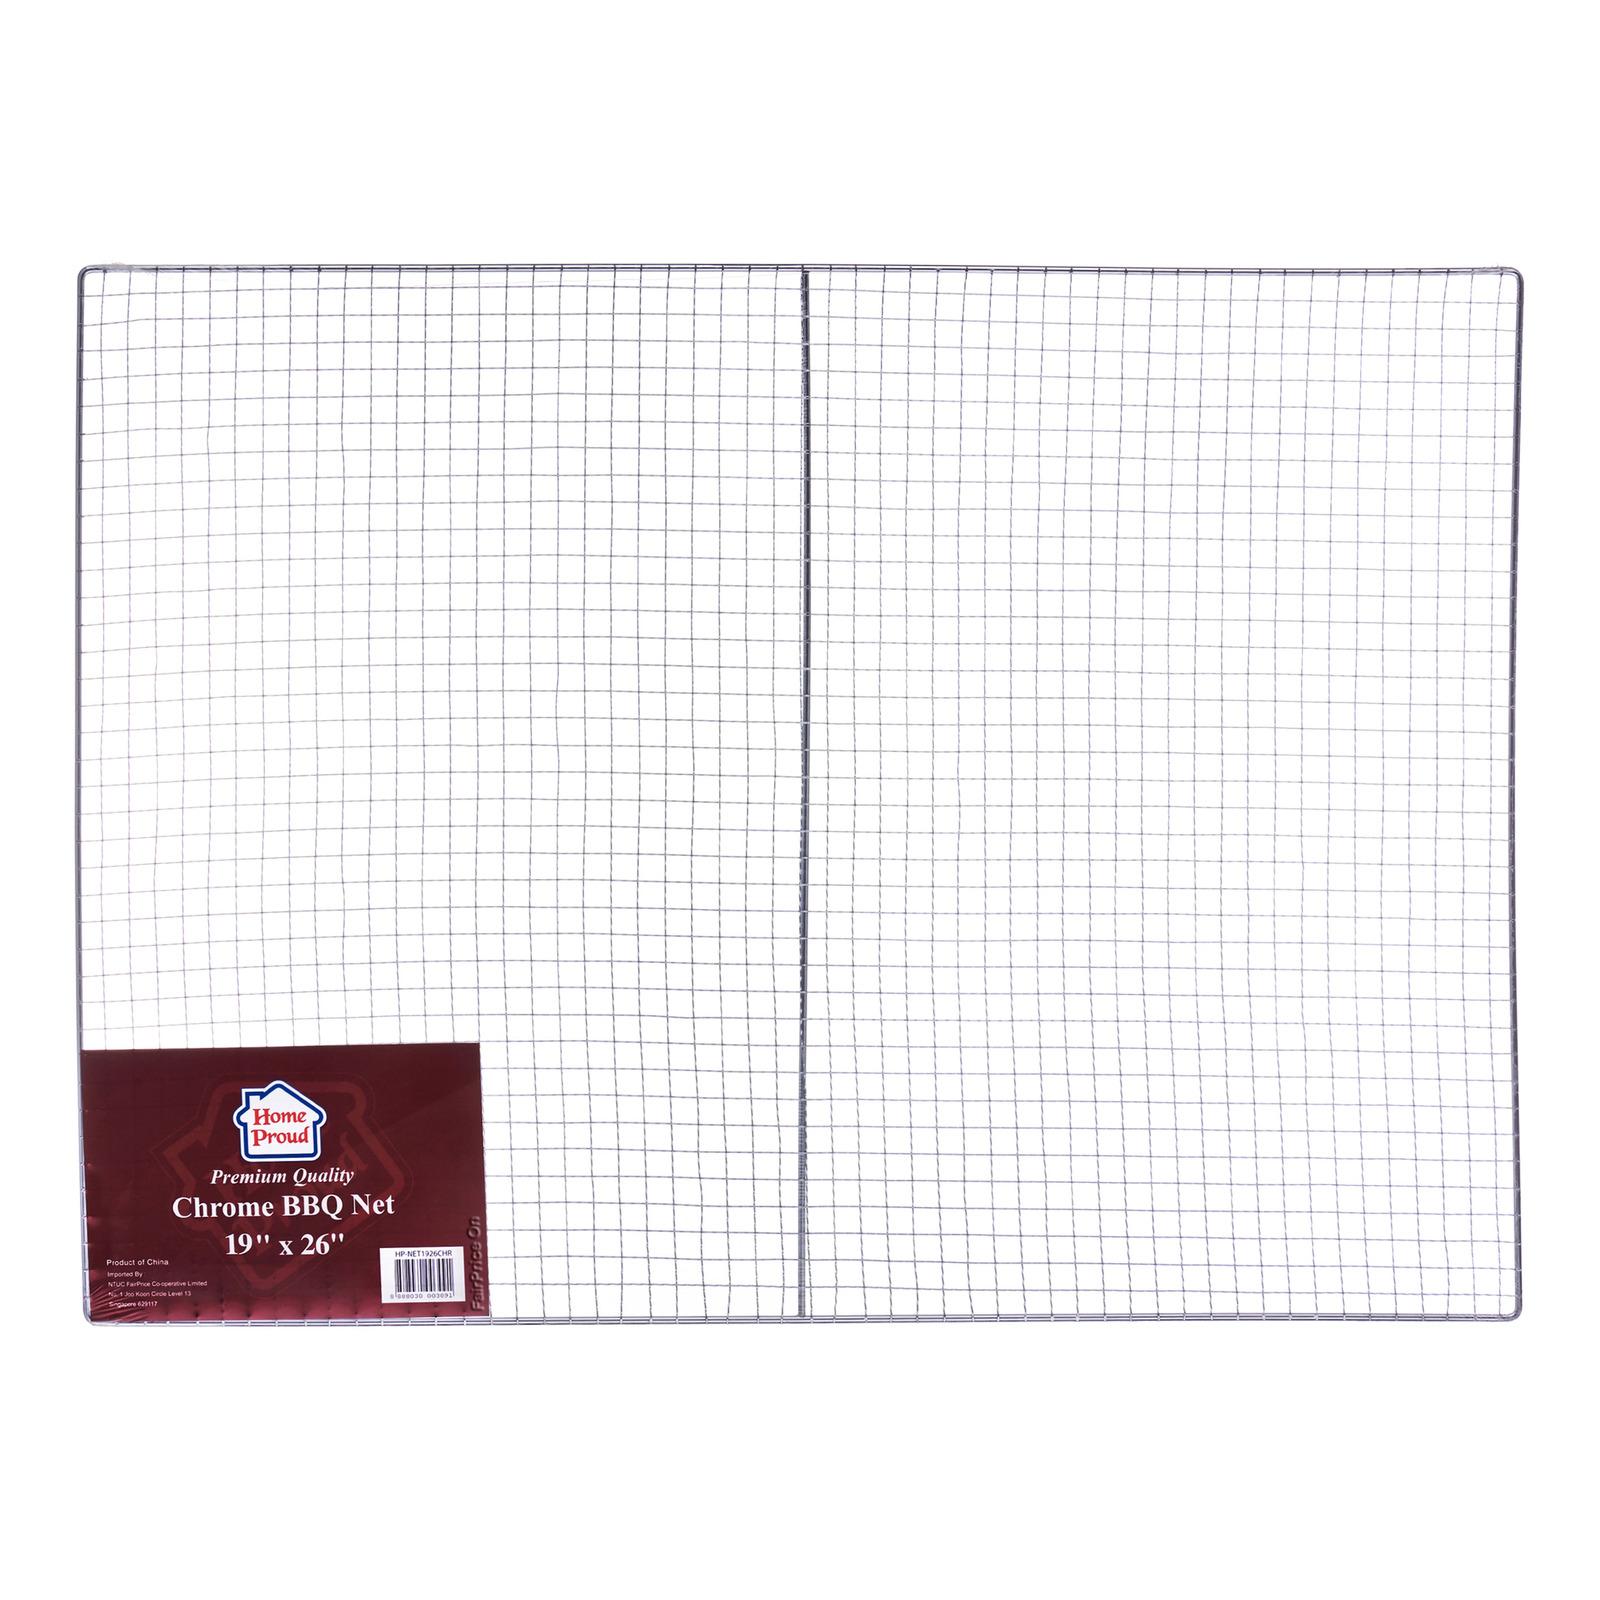 HomeProud Chrome BBQ Net - Rectangle